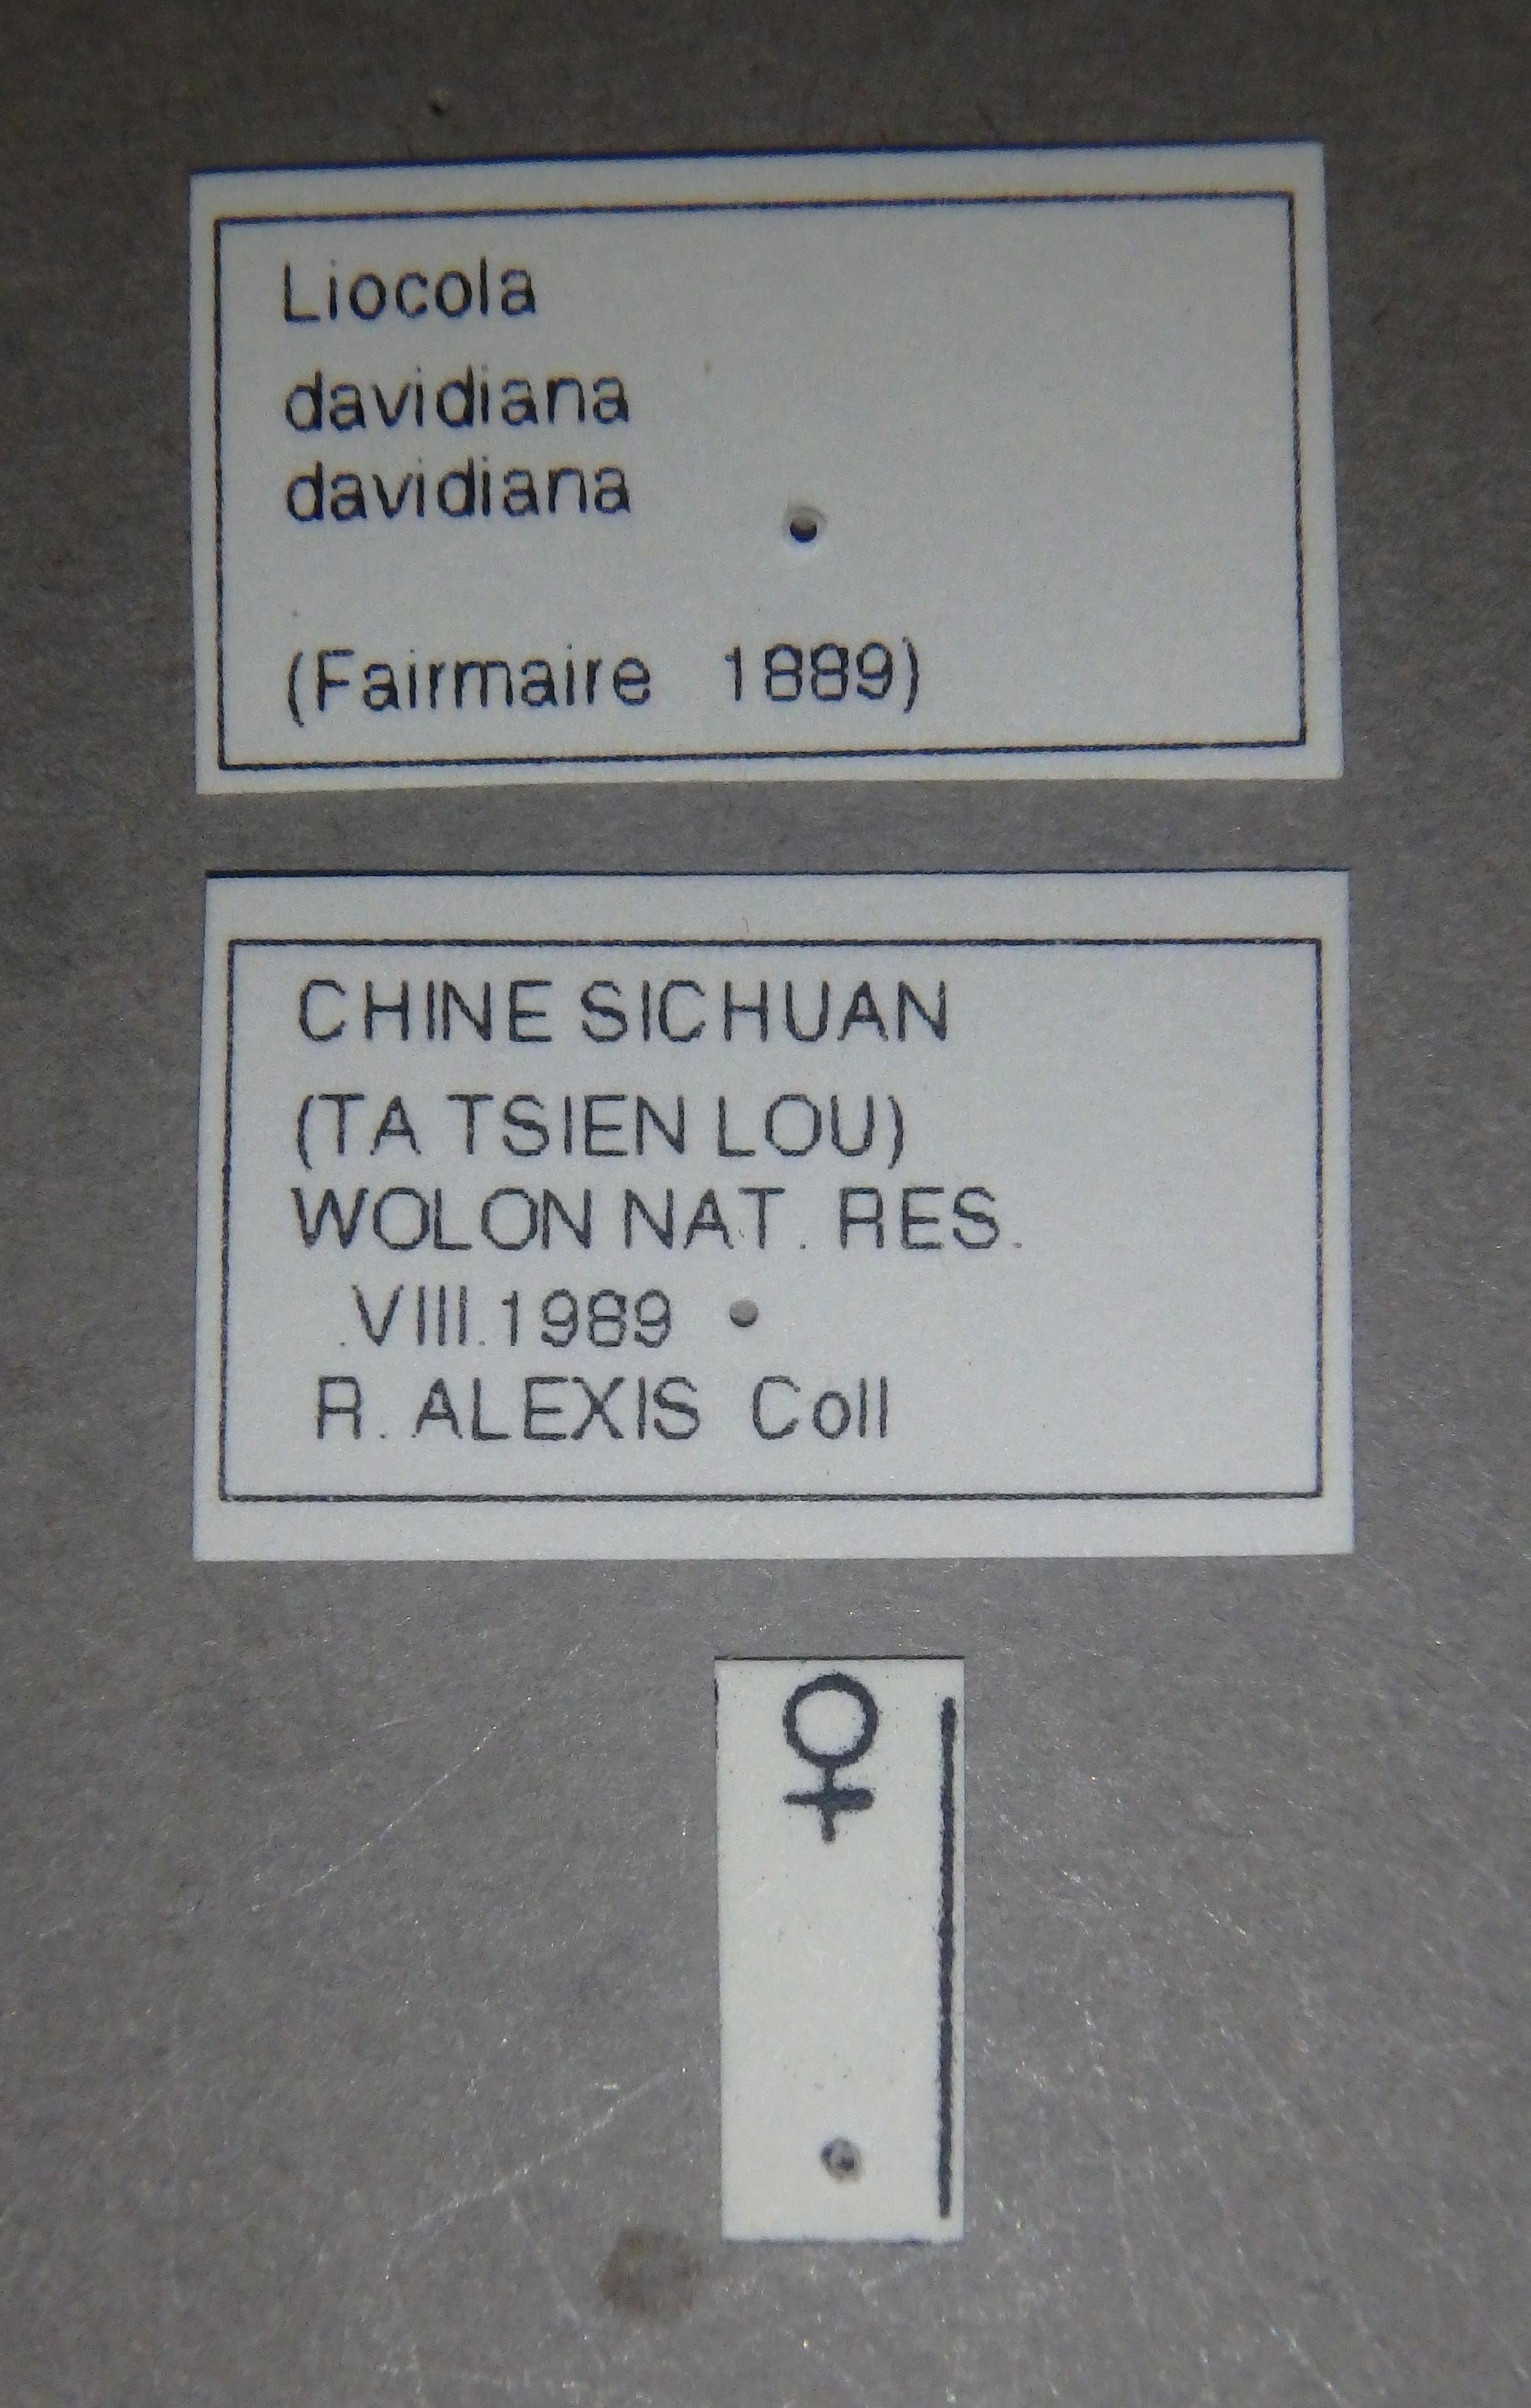 Liocola davidiana davidiana pt2 Lb.JPG